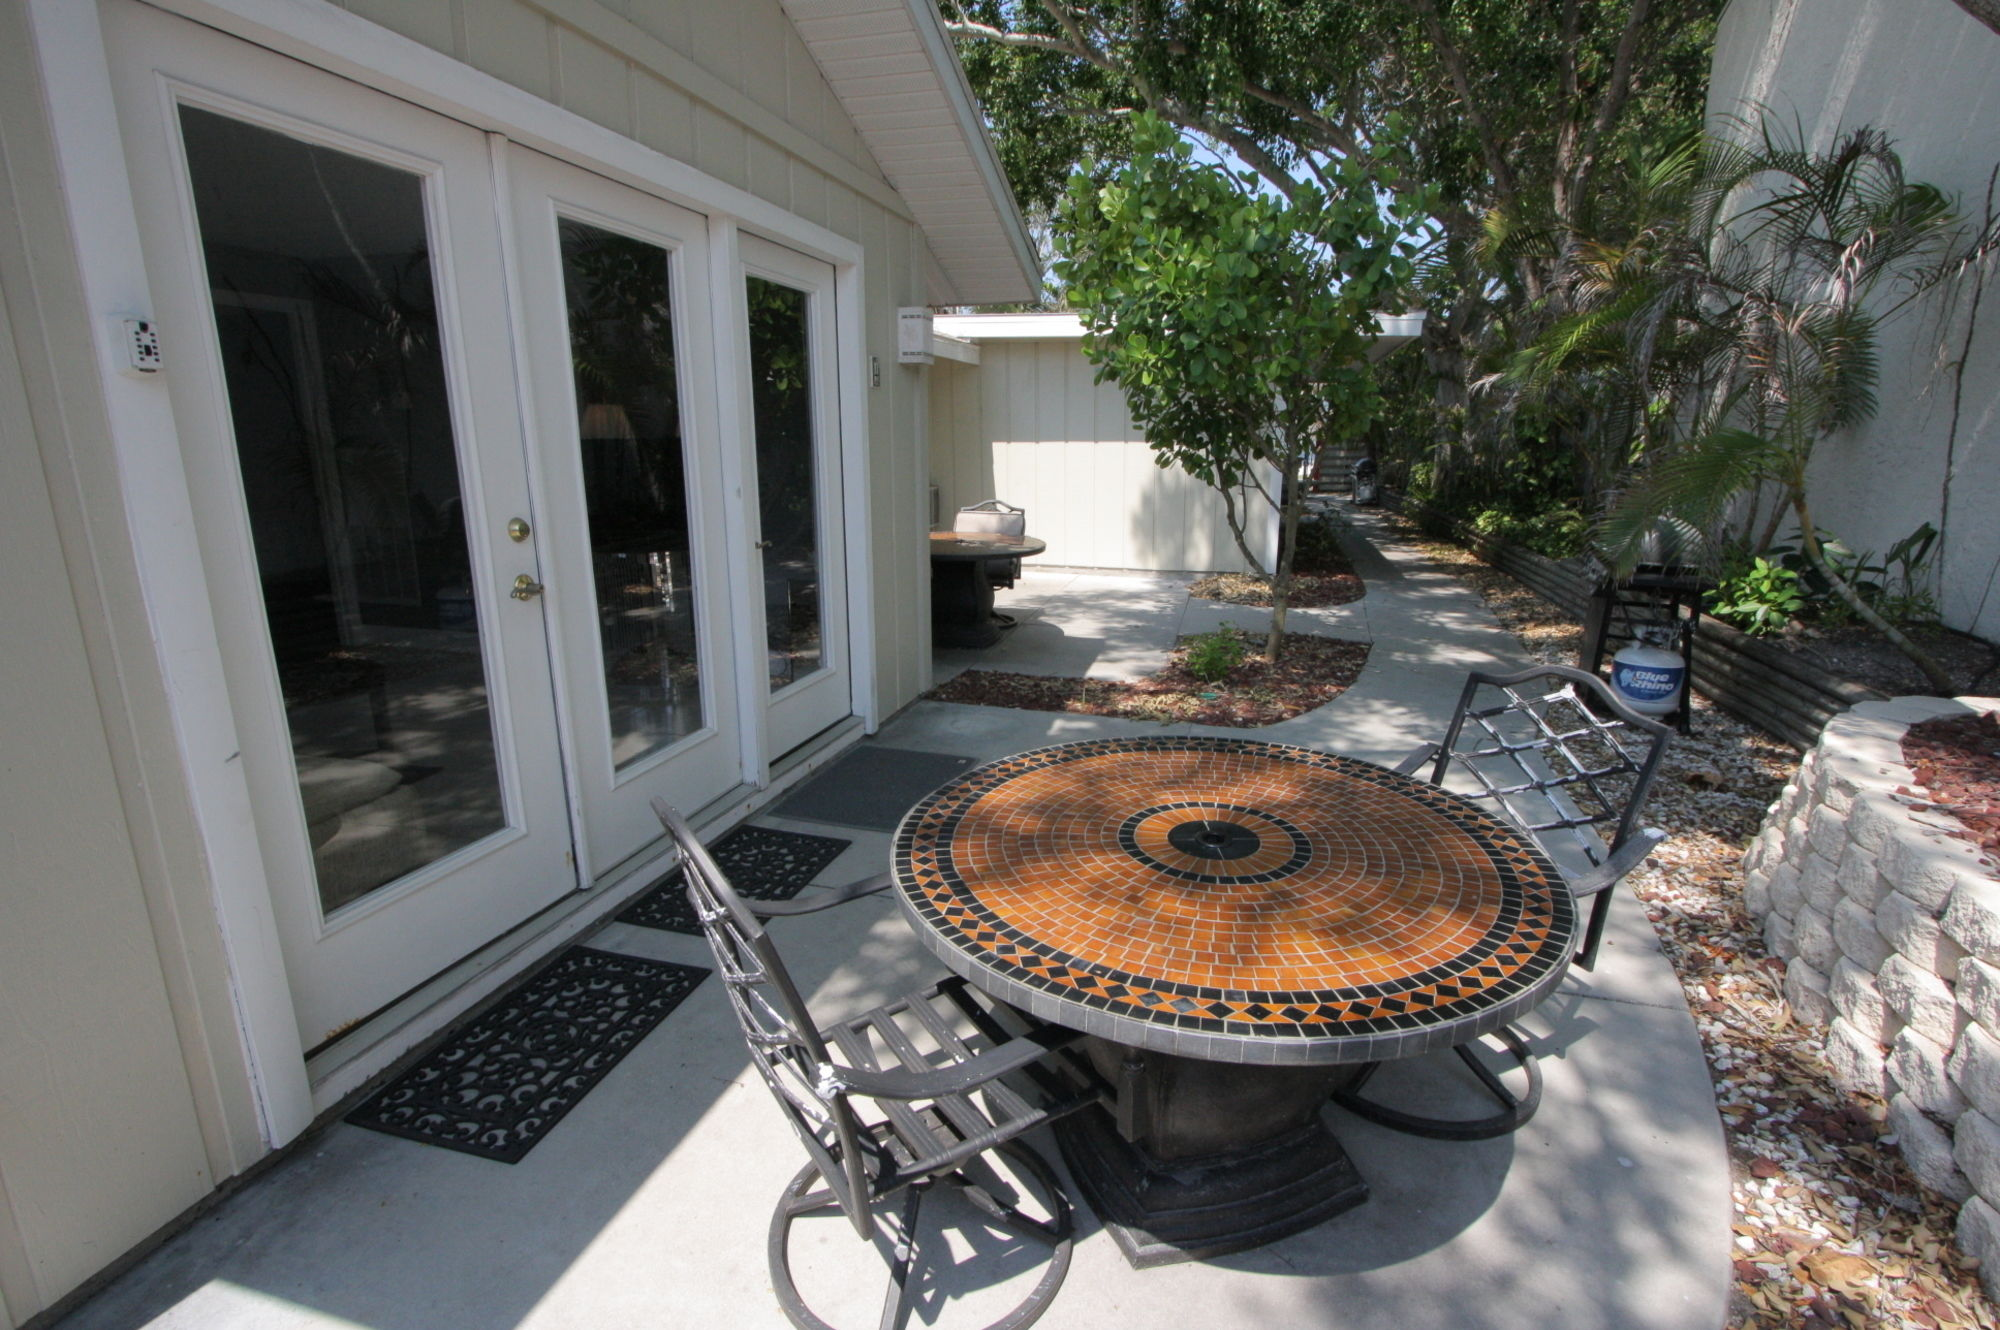 Siesta Gardens by RVA in Siesta Key, FL